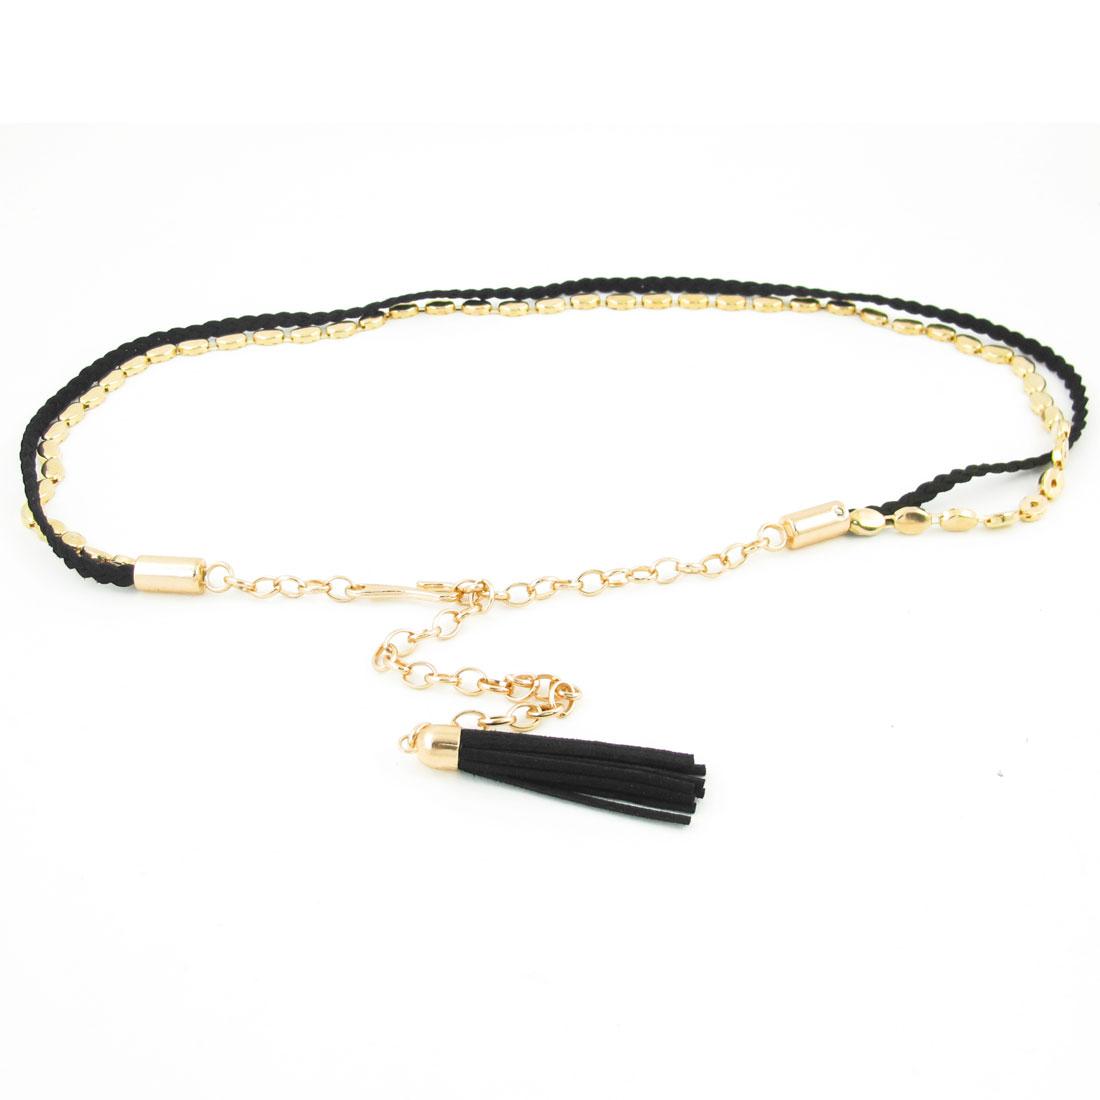 Woman Lobster Clasp Buckle Tassel Decor Gold Tone Black Waist Chain Belt